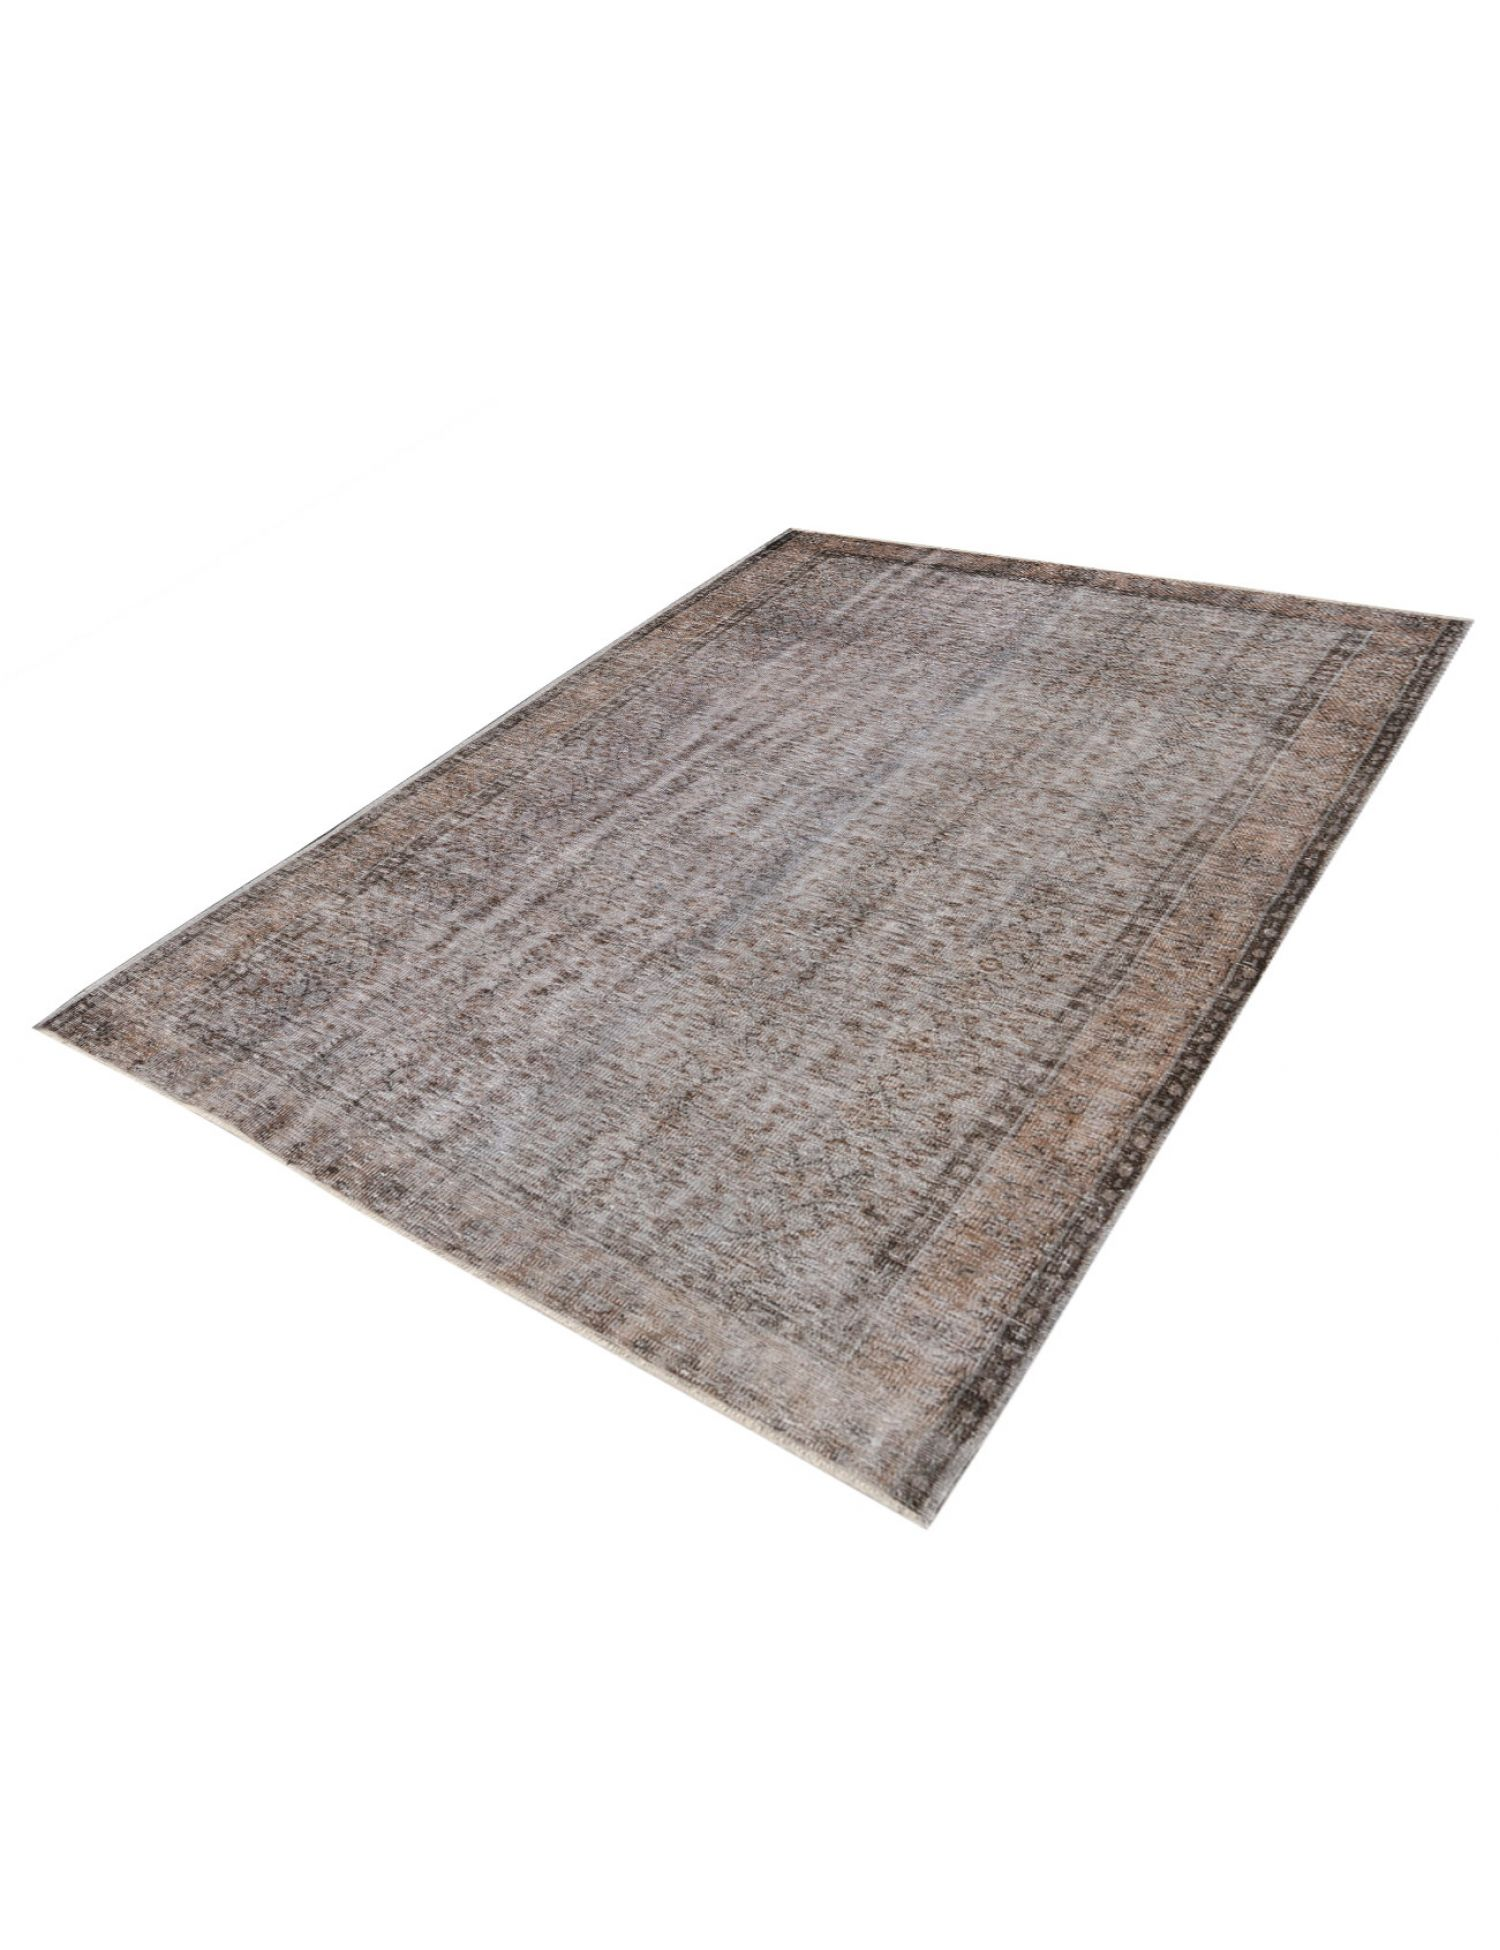 Vintage Teppich  grau <br/>277 x 188 cm